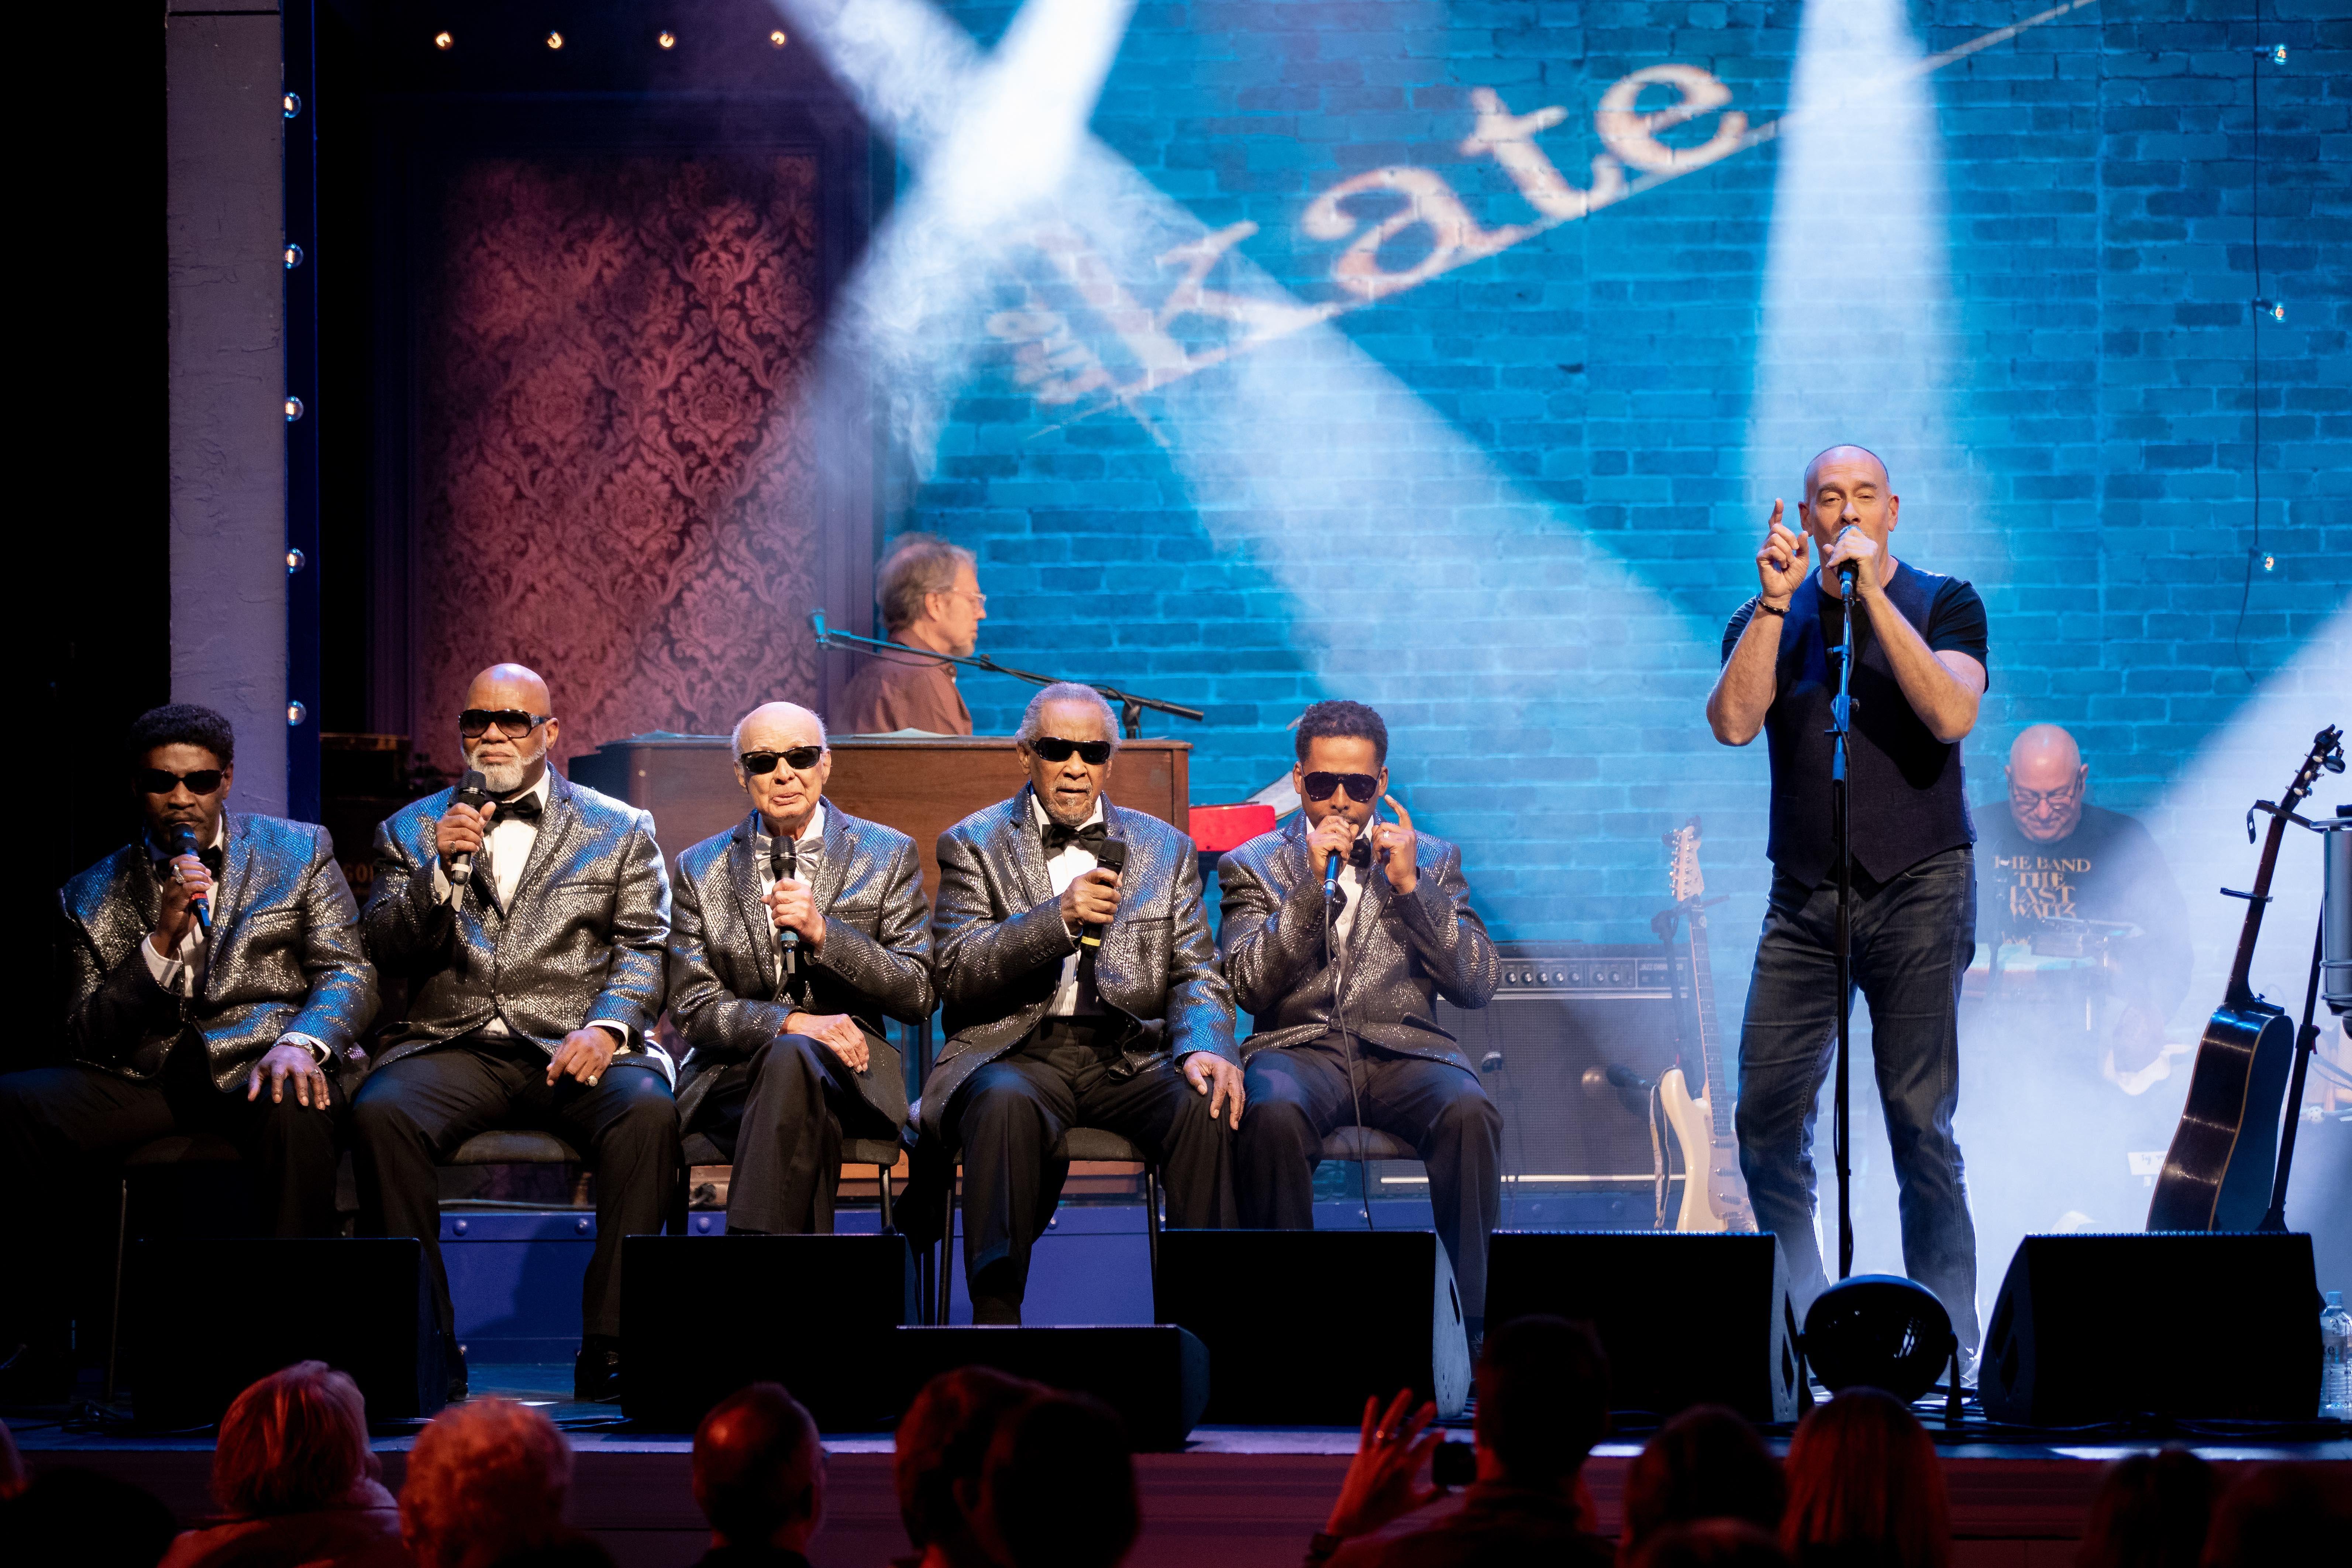 Marc Cohn and Blind Boys of Alabama